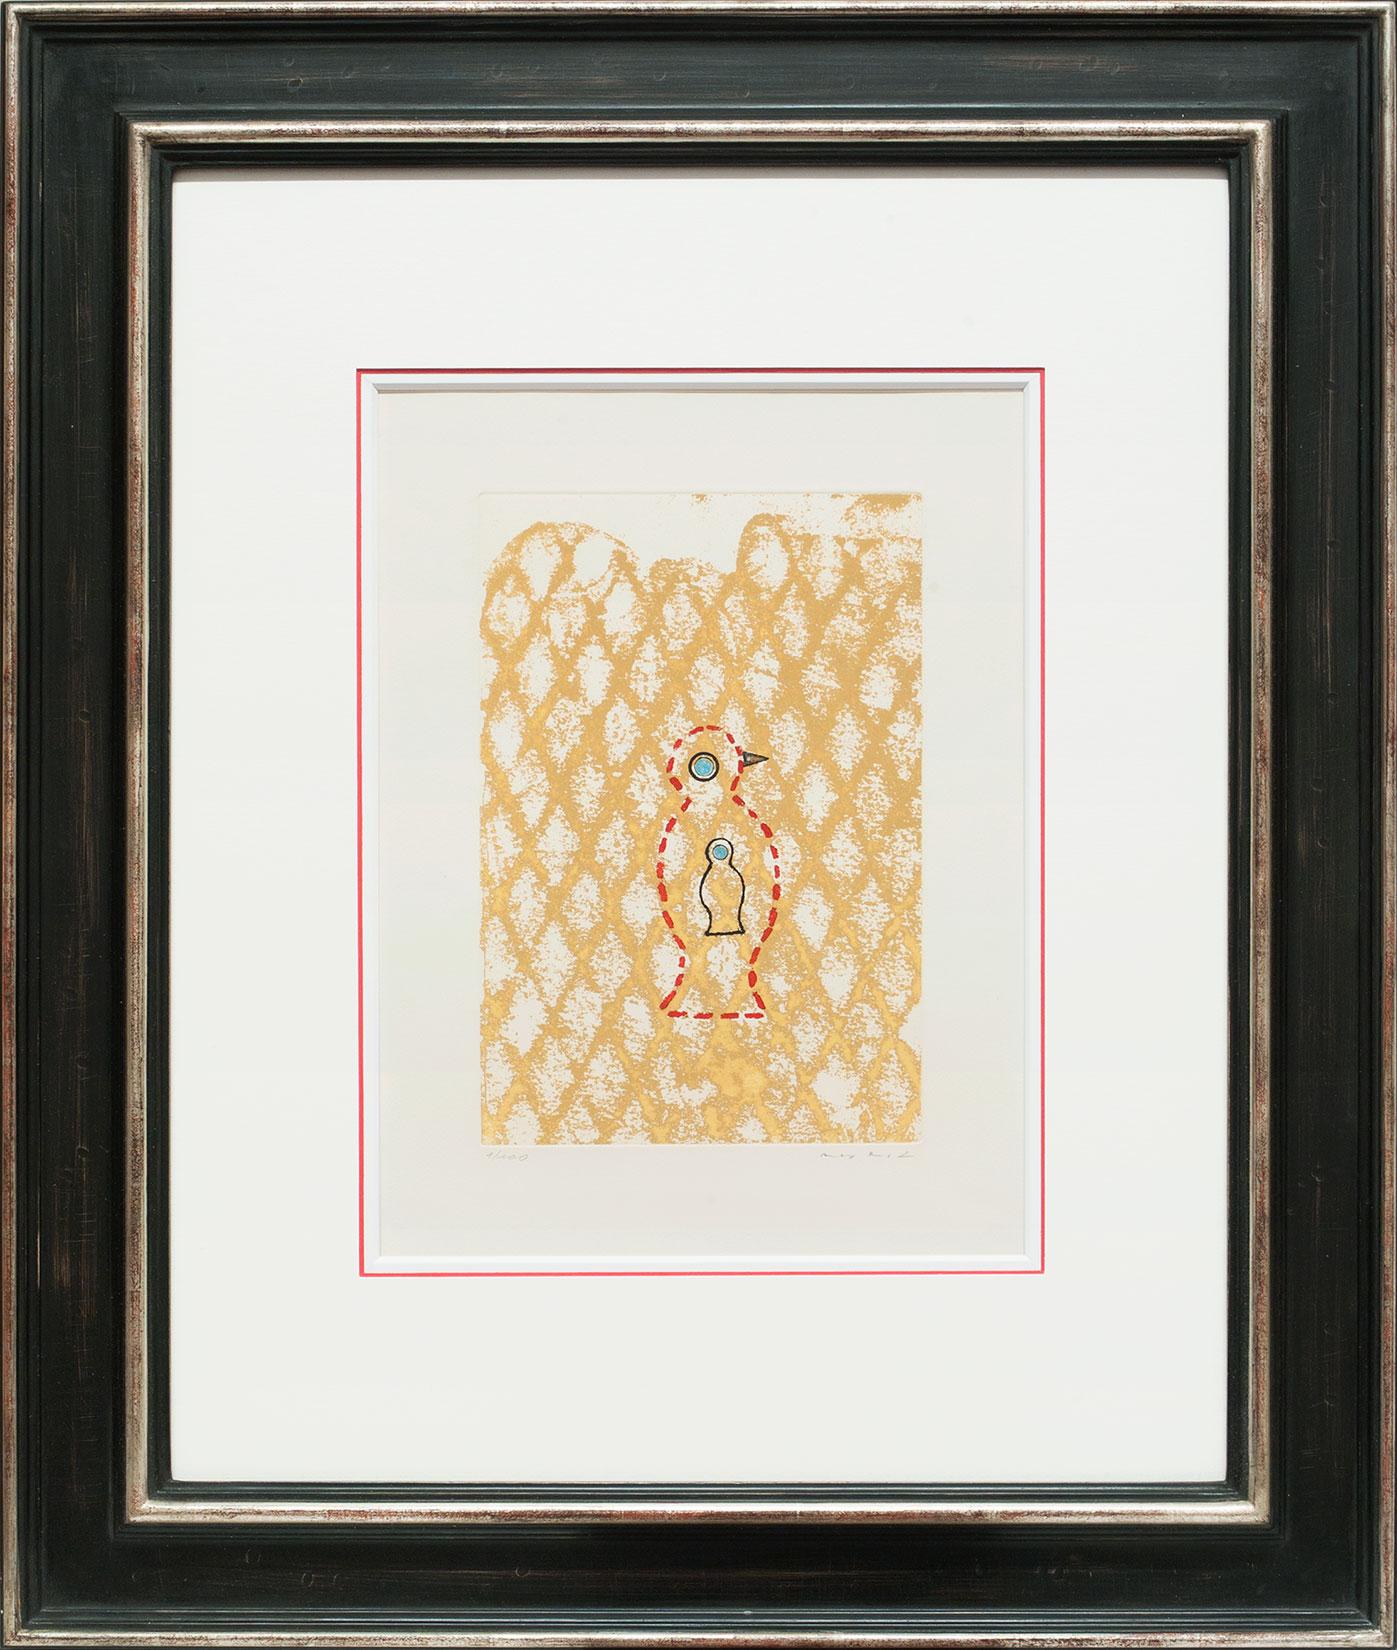 Max Ernst « Oiseau » Galerie Française